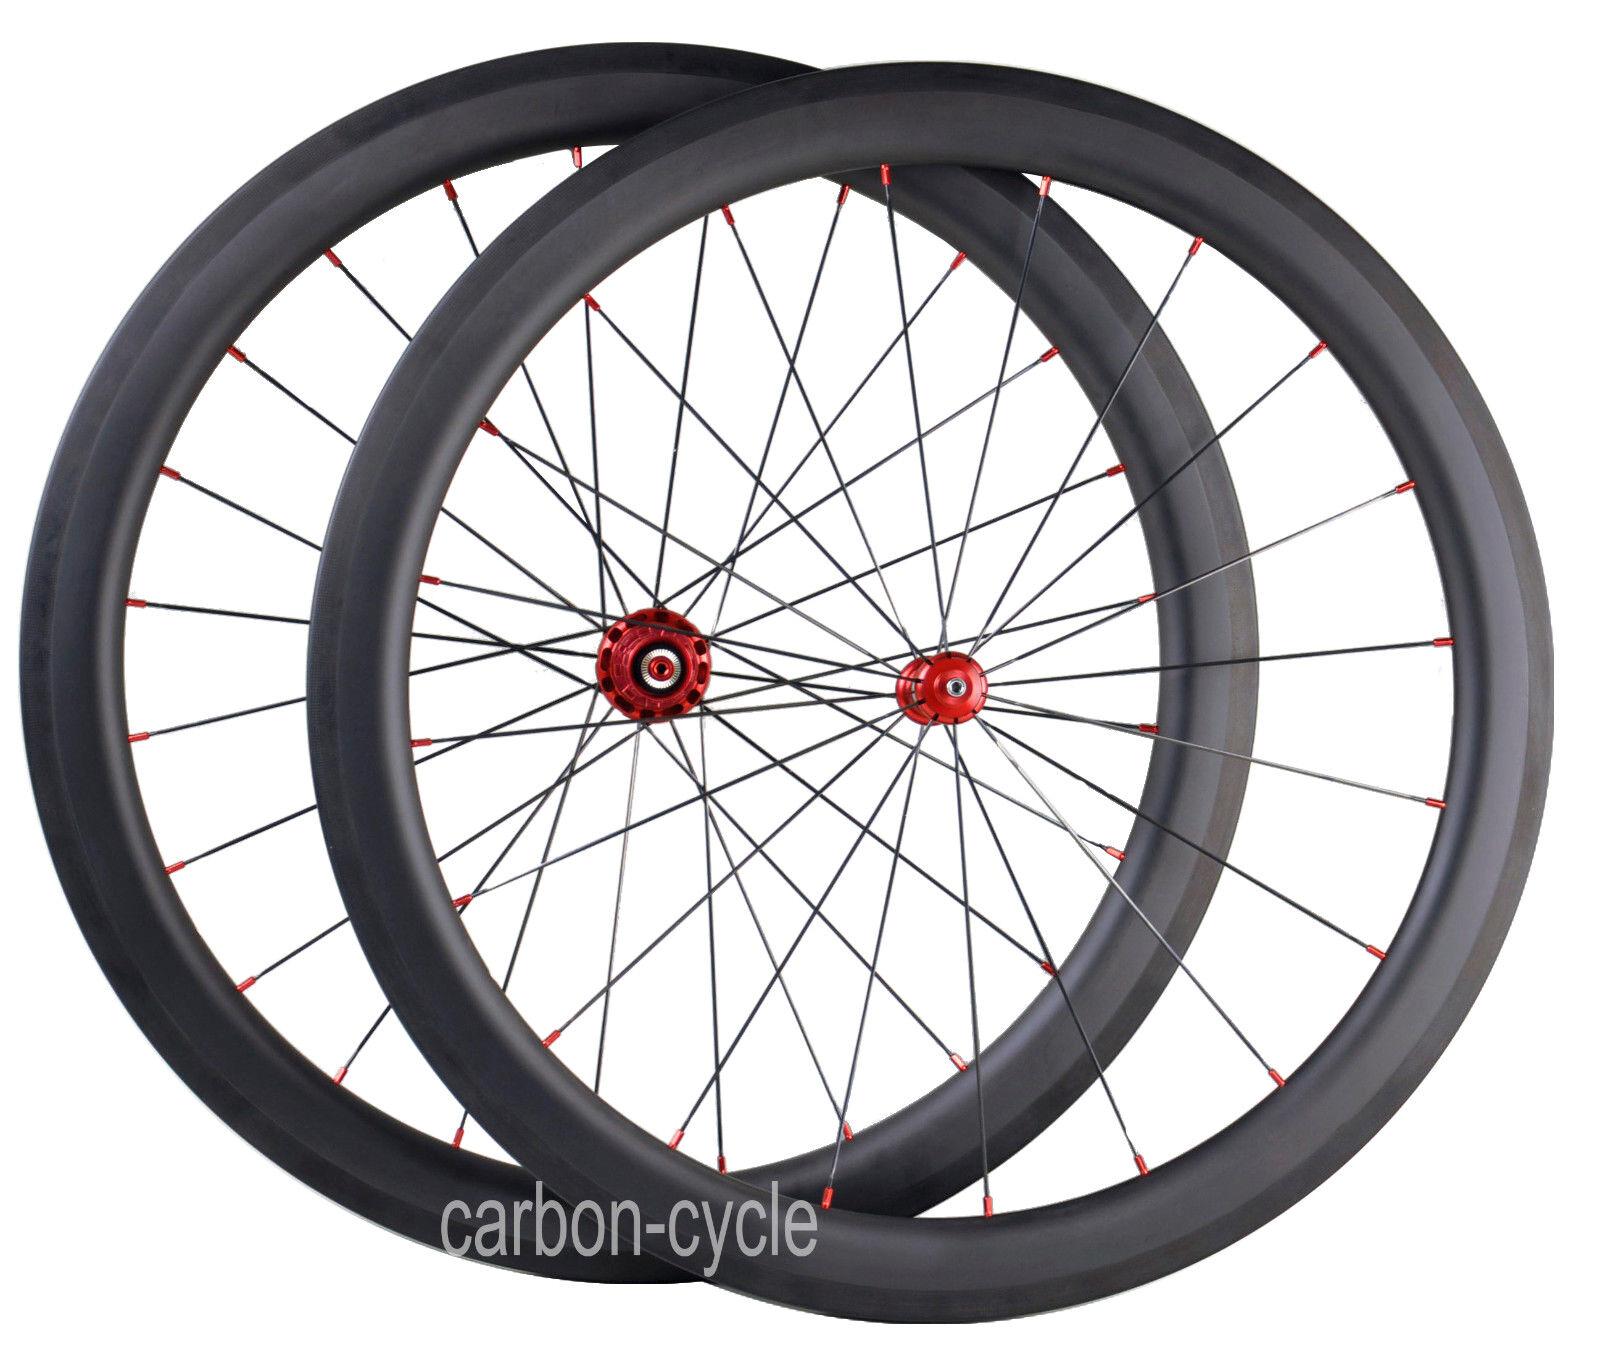 Sapim 50mm Carbon Clincher Wheel Straight pull 700C R36 Road Bicycle Rim UD Matt